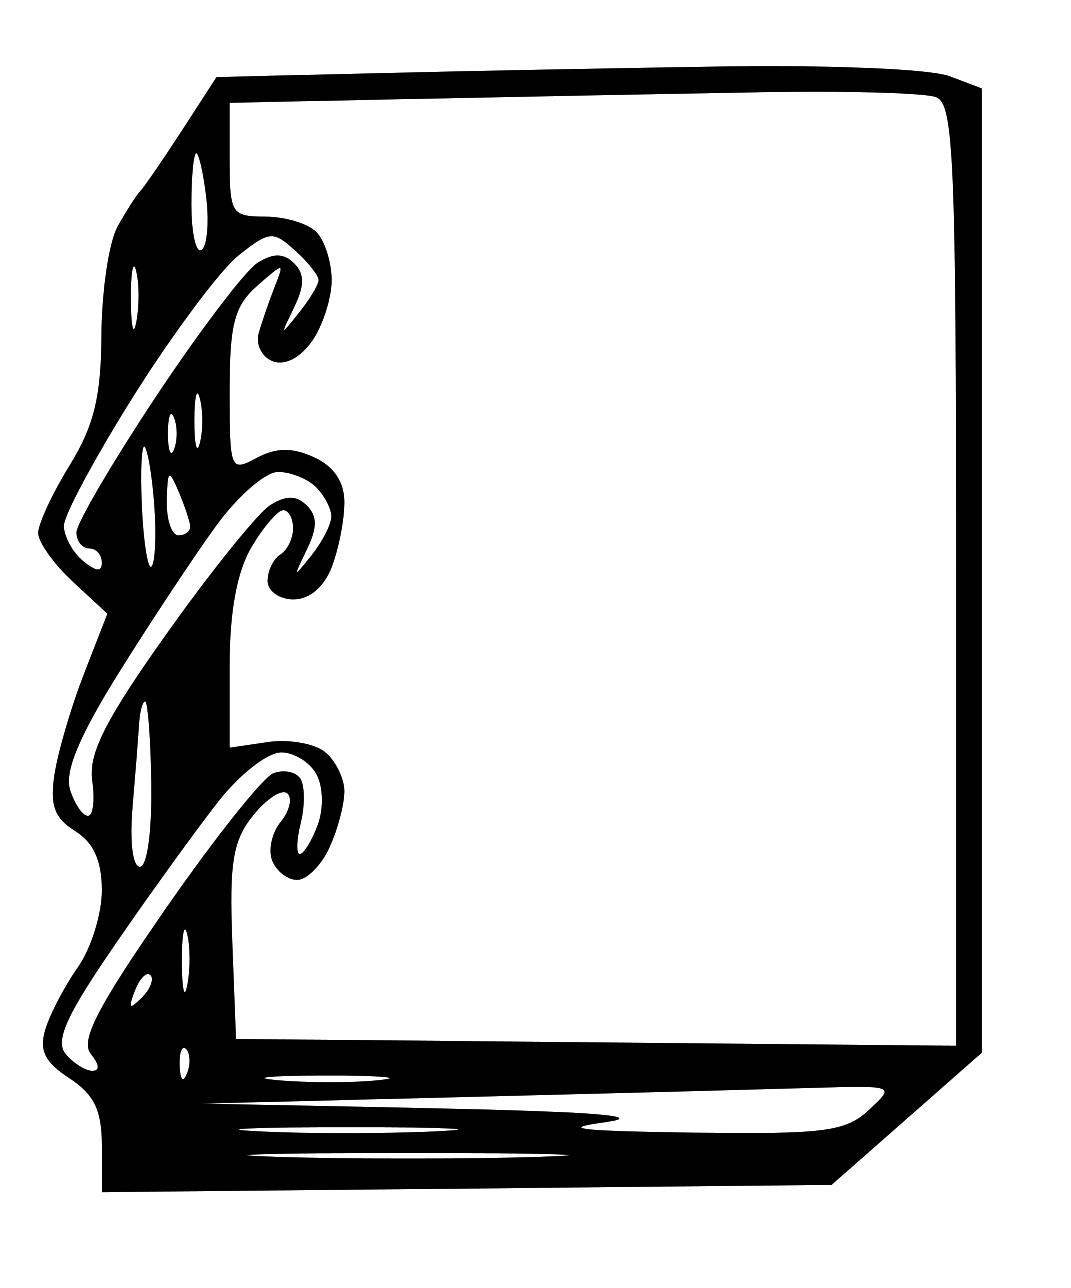 Book Of Mormon Clipart - Cliparts.co